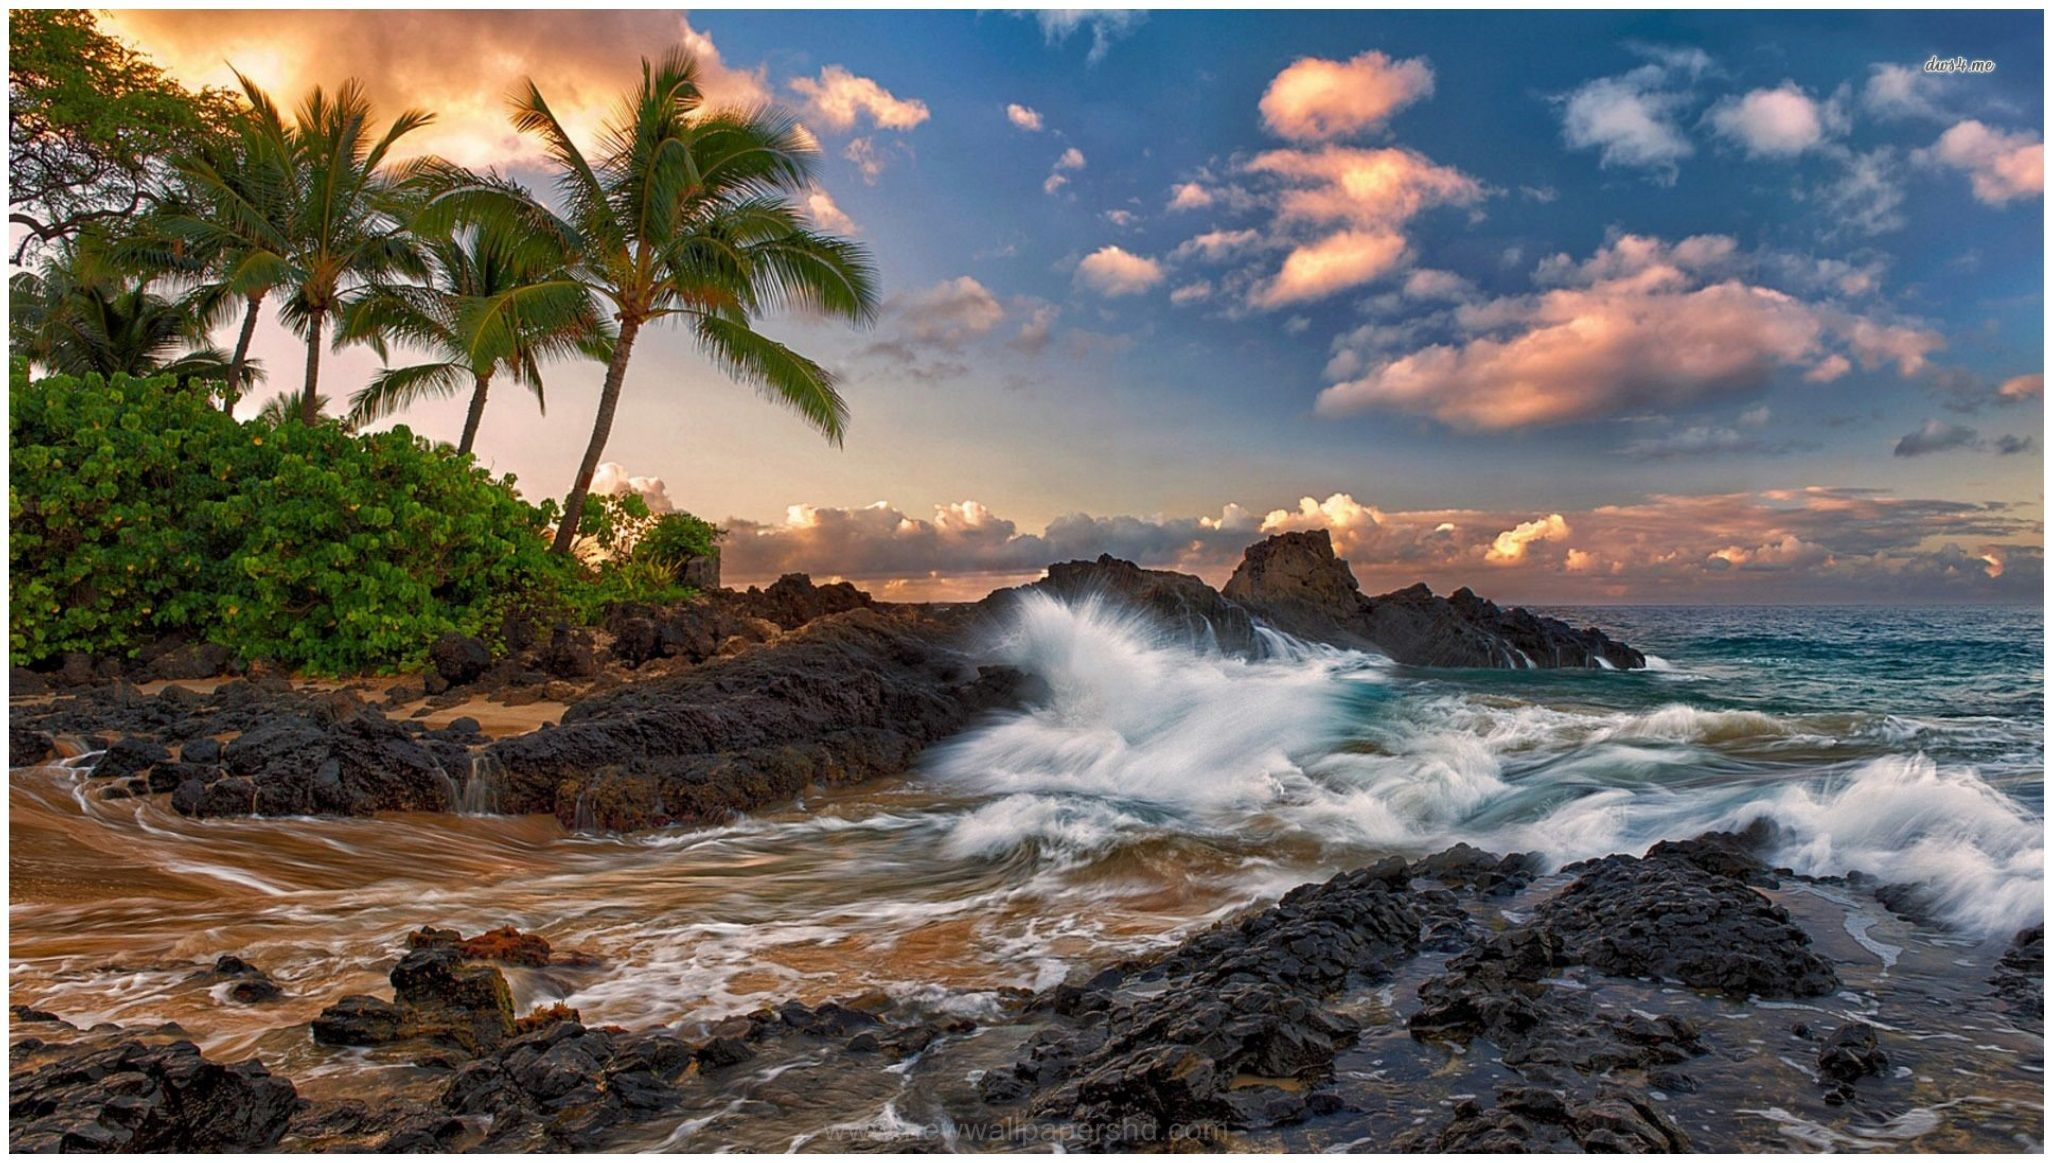 Maui Island Hawaii Hd Wallpaper Hawaii Landscape Maui Island Hawaii Beautiful Beaches